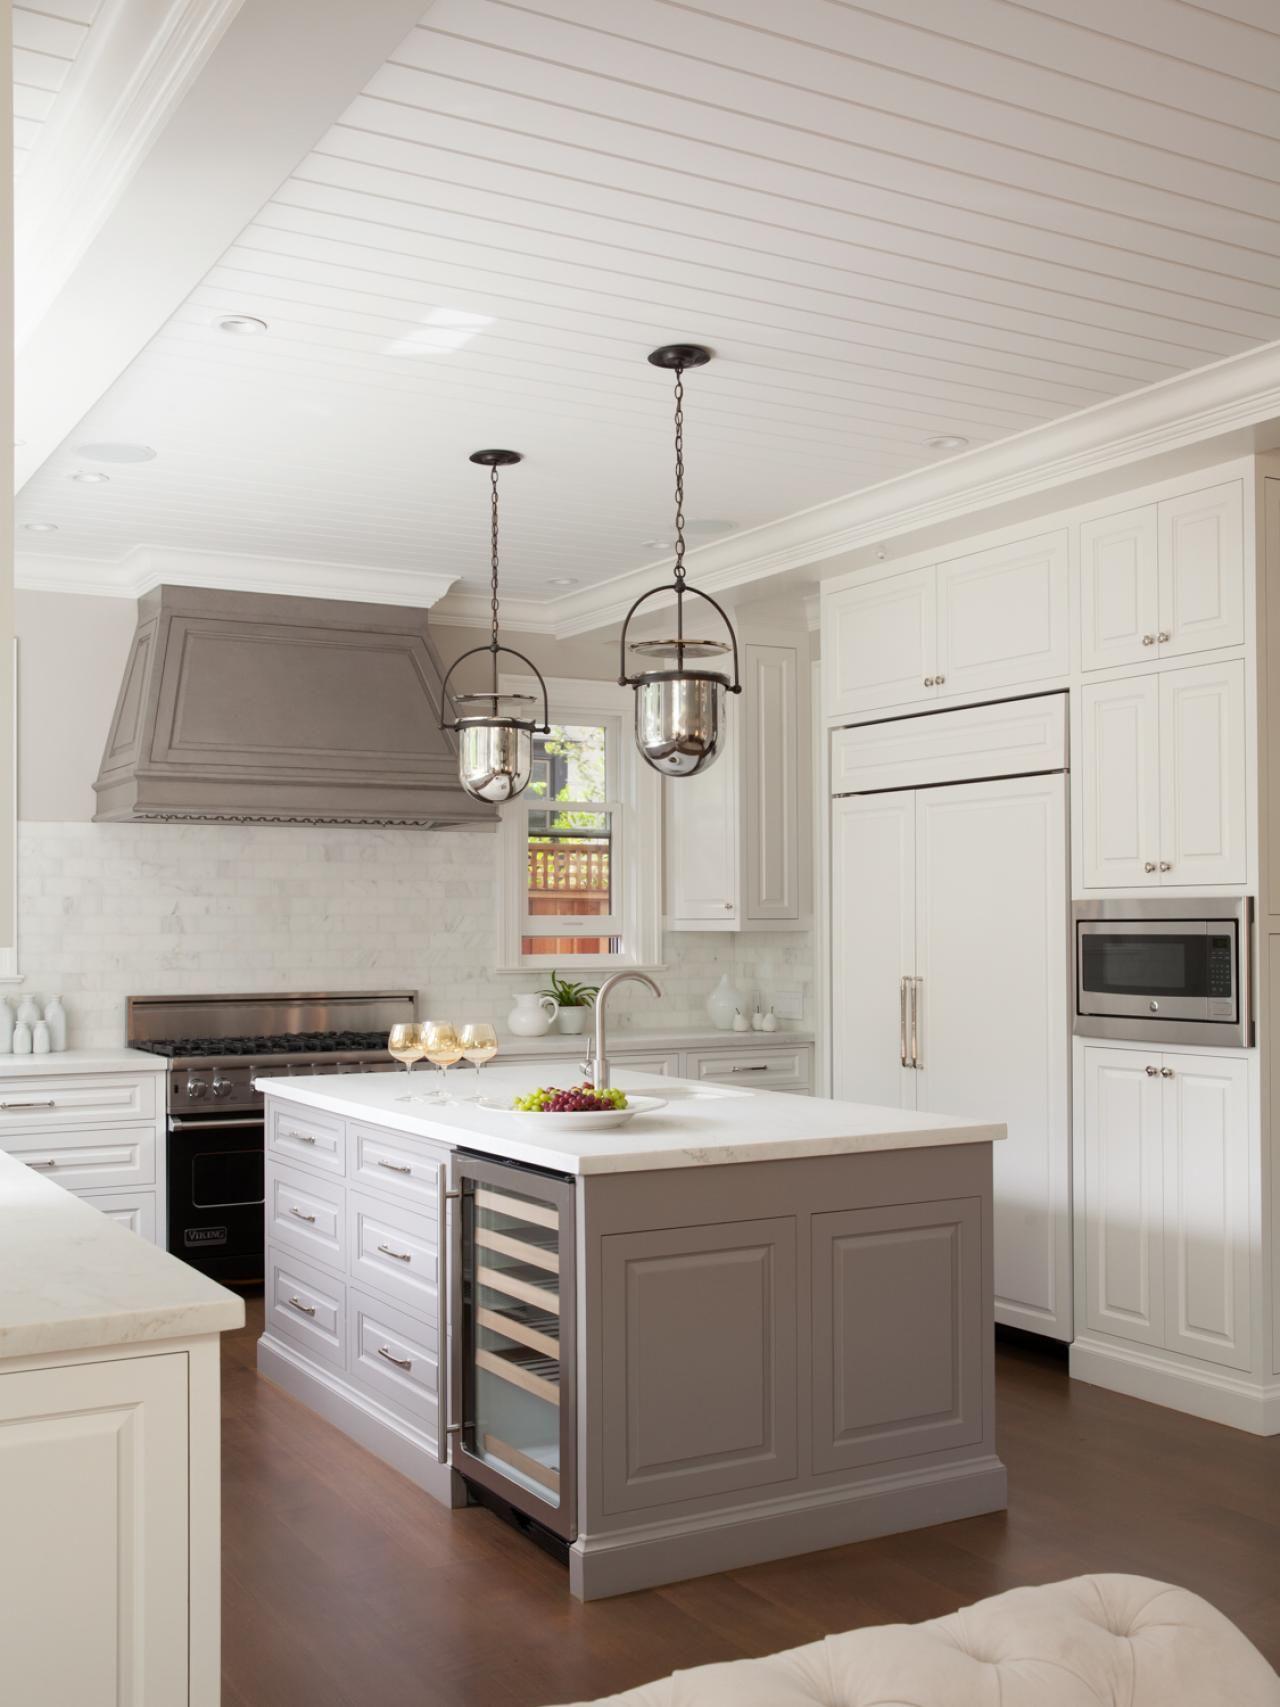 Kitchen Island With Prep Sink Best Designs Gray W And Wine Fridge Carrara